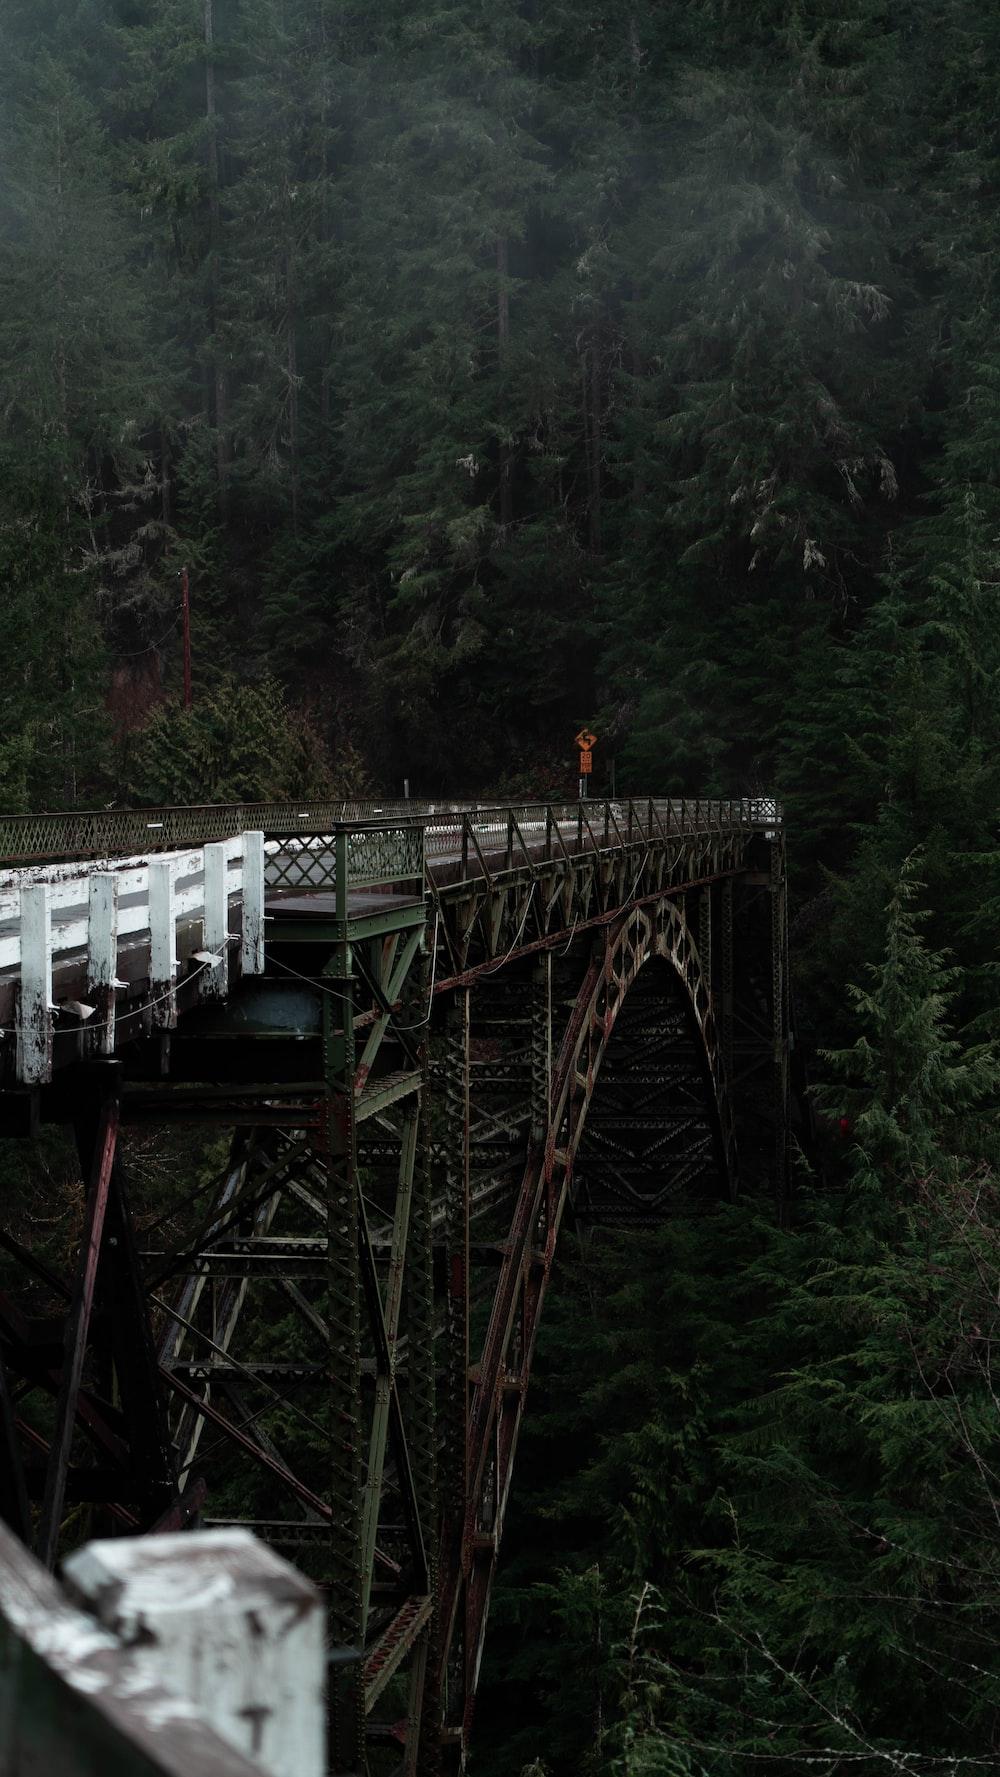 metal arch bridge facing trees